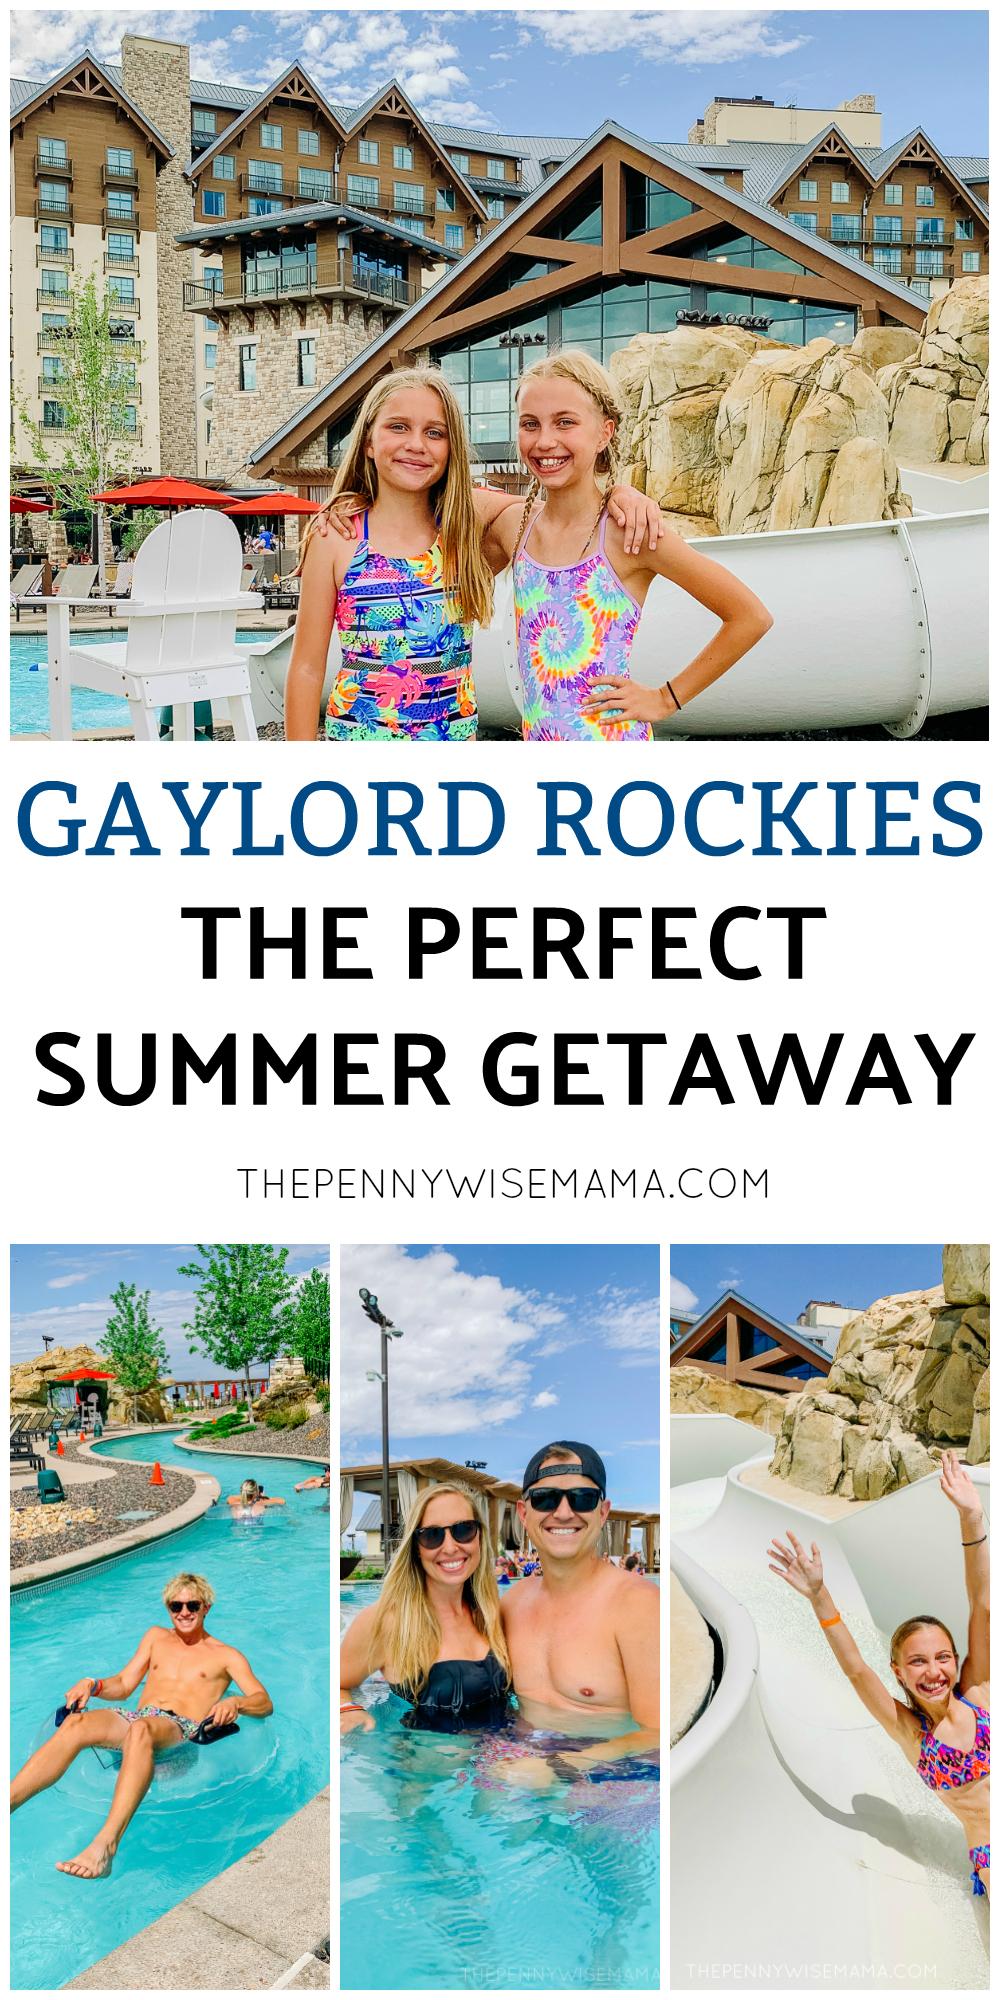 Plan a fun family getaway to Gaylord Rockies this summer! #GaylordRockies #vacation #staycation #familytravel #travel #luxuryresort